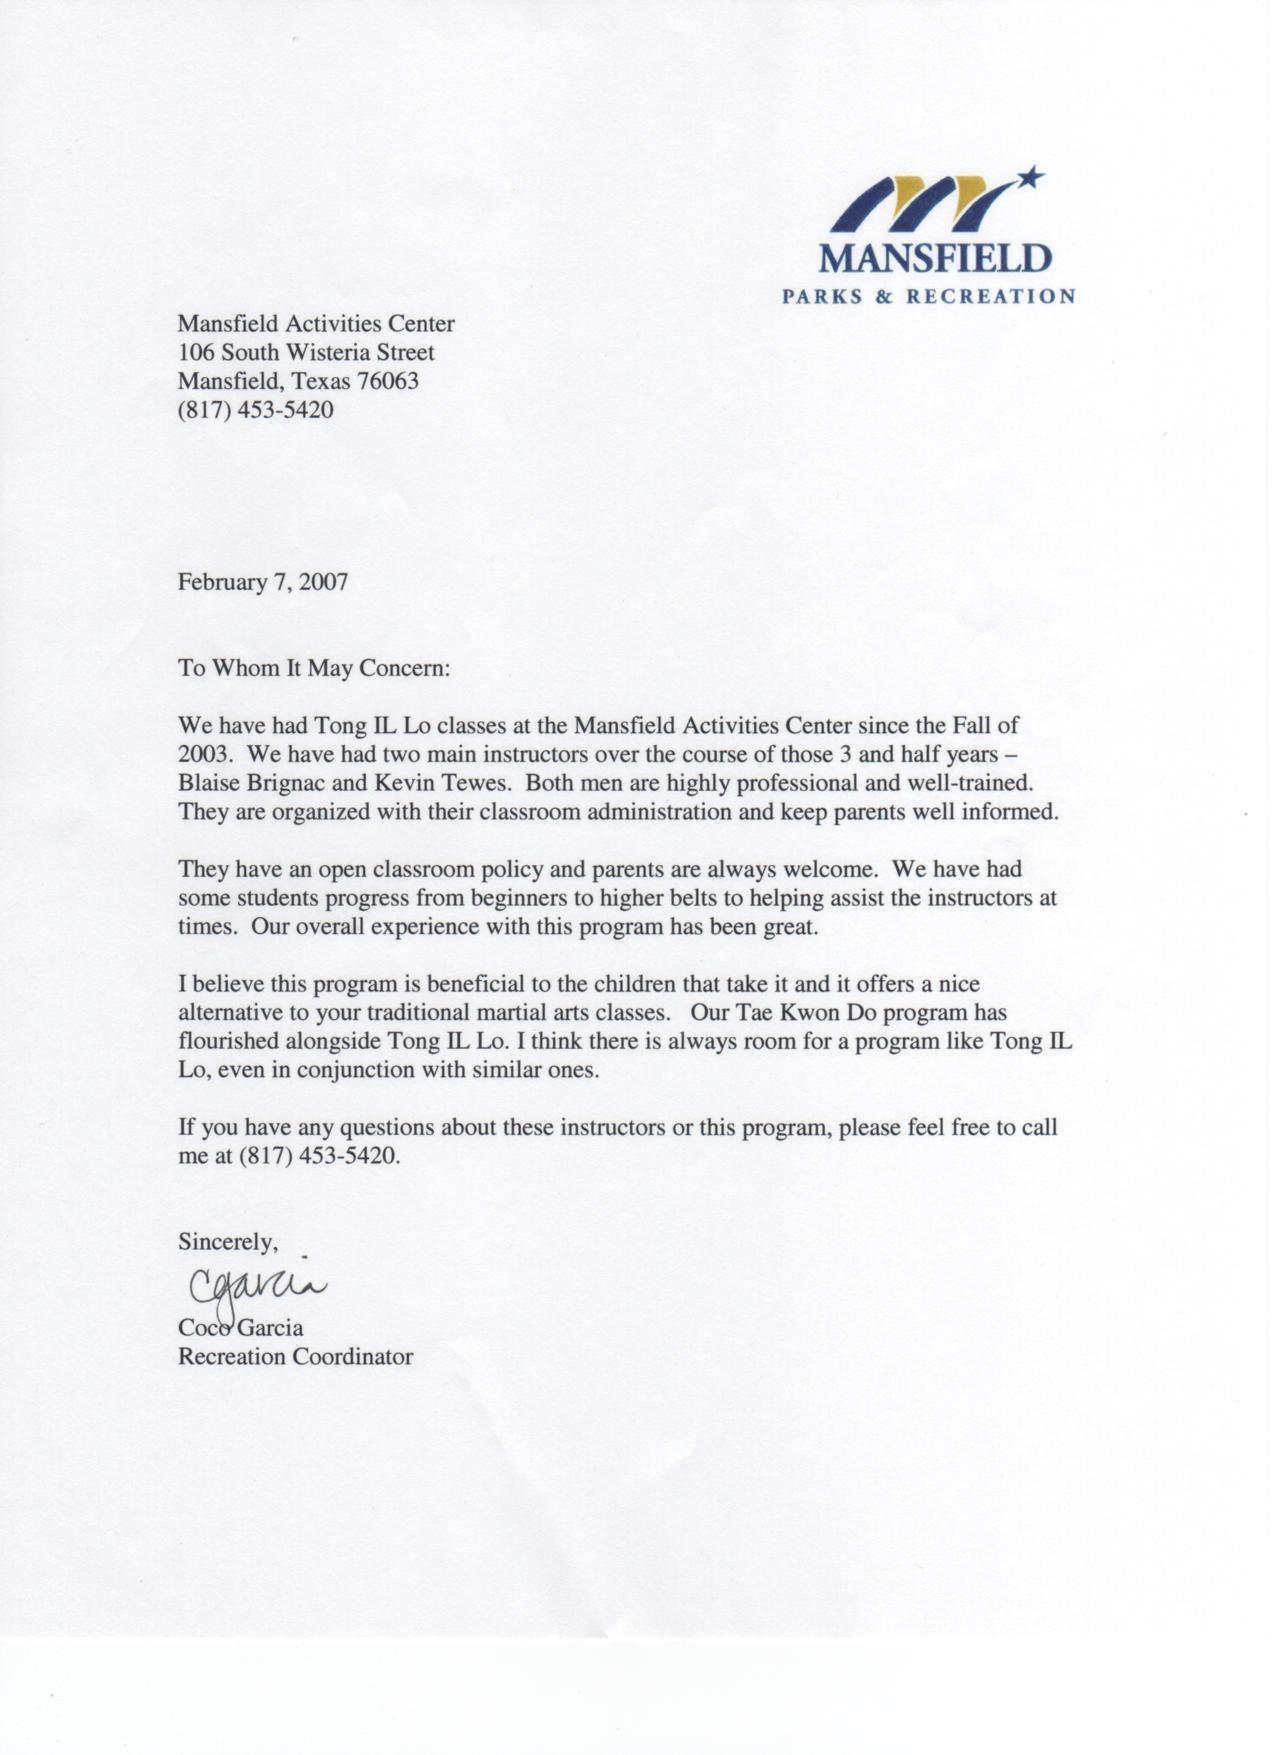 Mansfield Recommendation Letter.JPG